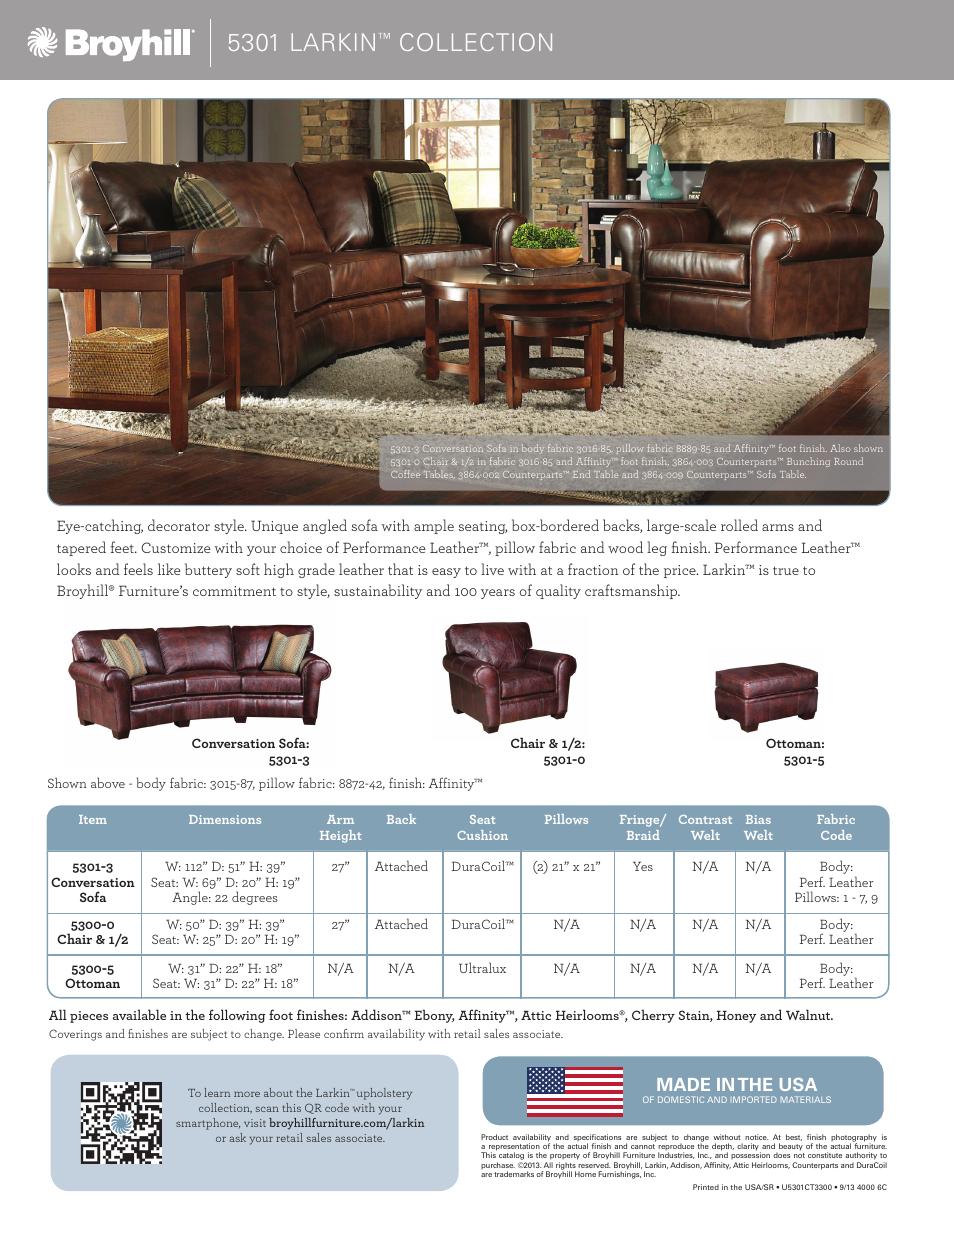 Peachy 5301 Larkin Collection Made In The Usa Broyhill Larkin Evergreenethics Interior Chair Design Evergreenethicsorg